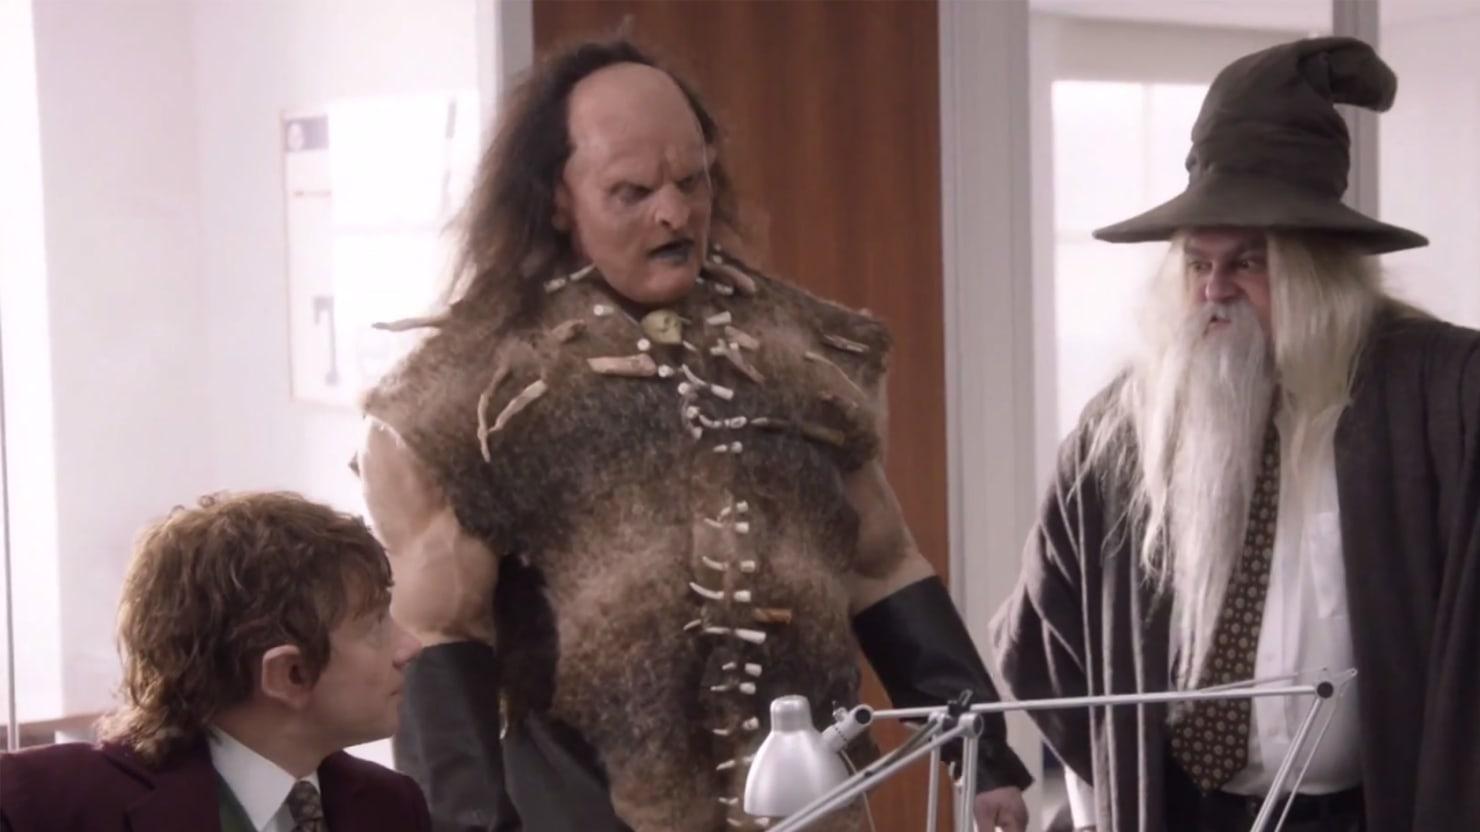 SNL's 'Office/Hobbit' Parody is Perfect